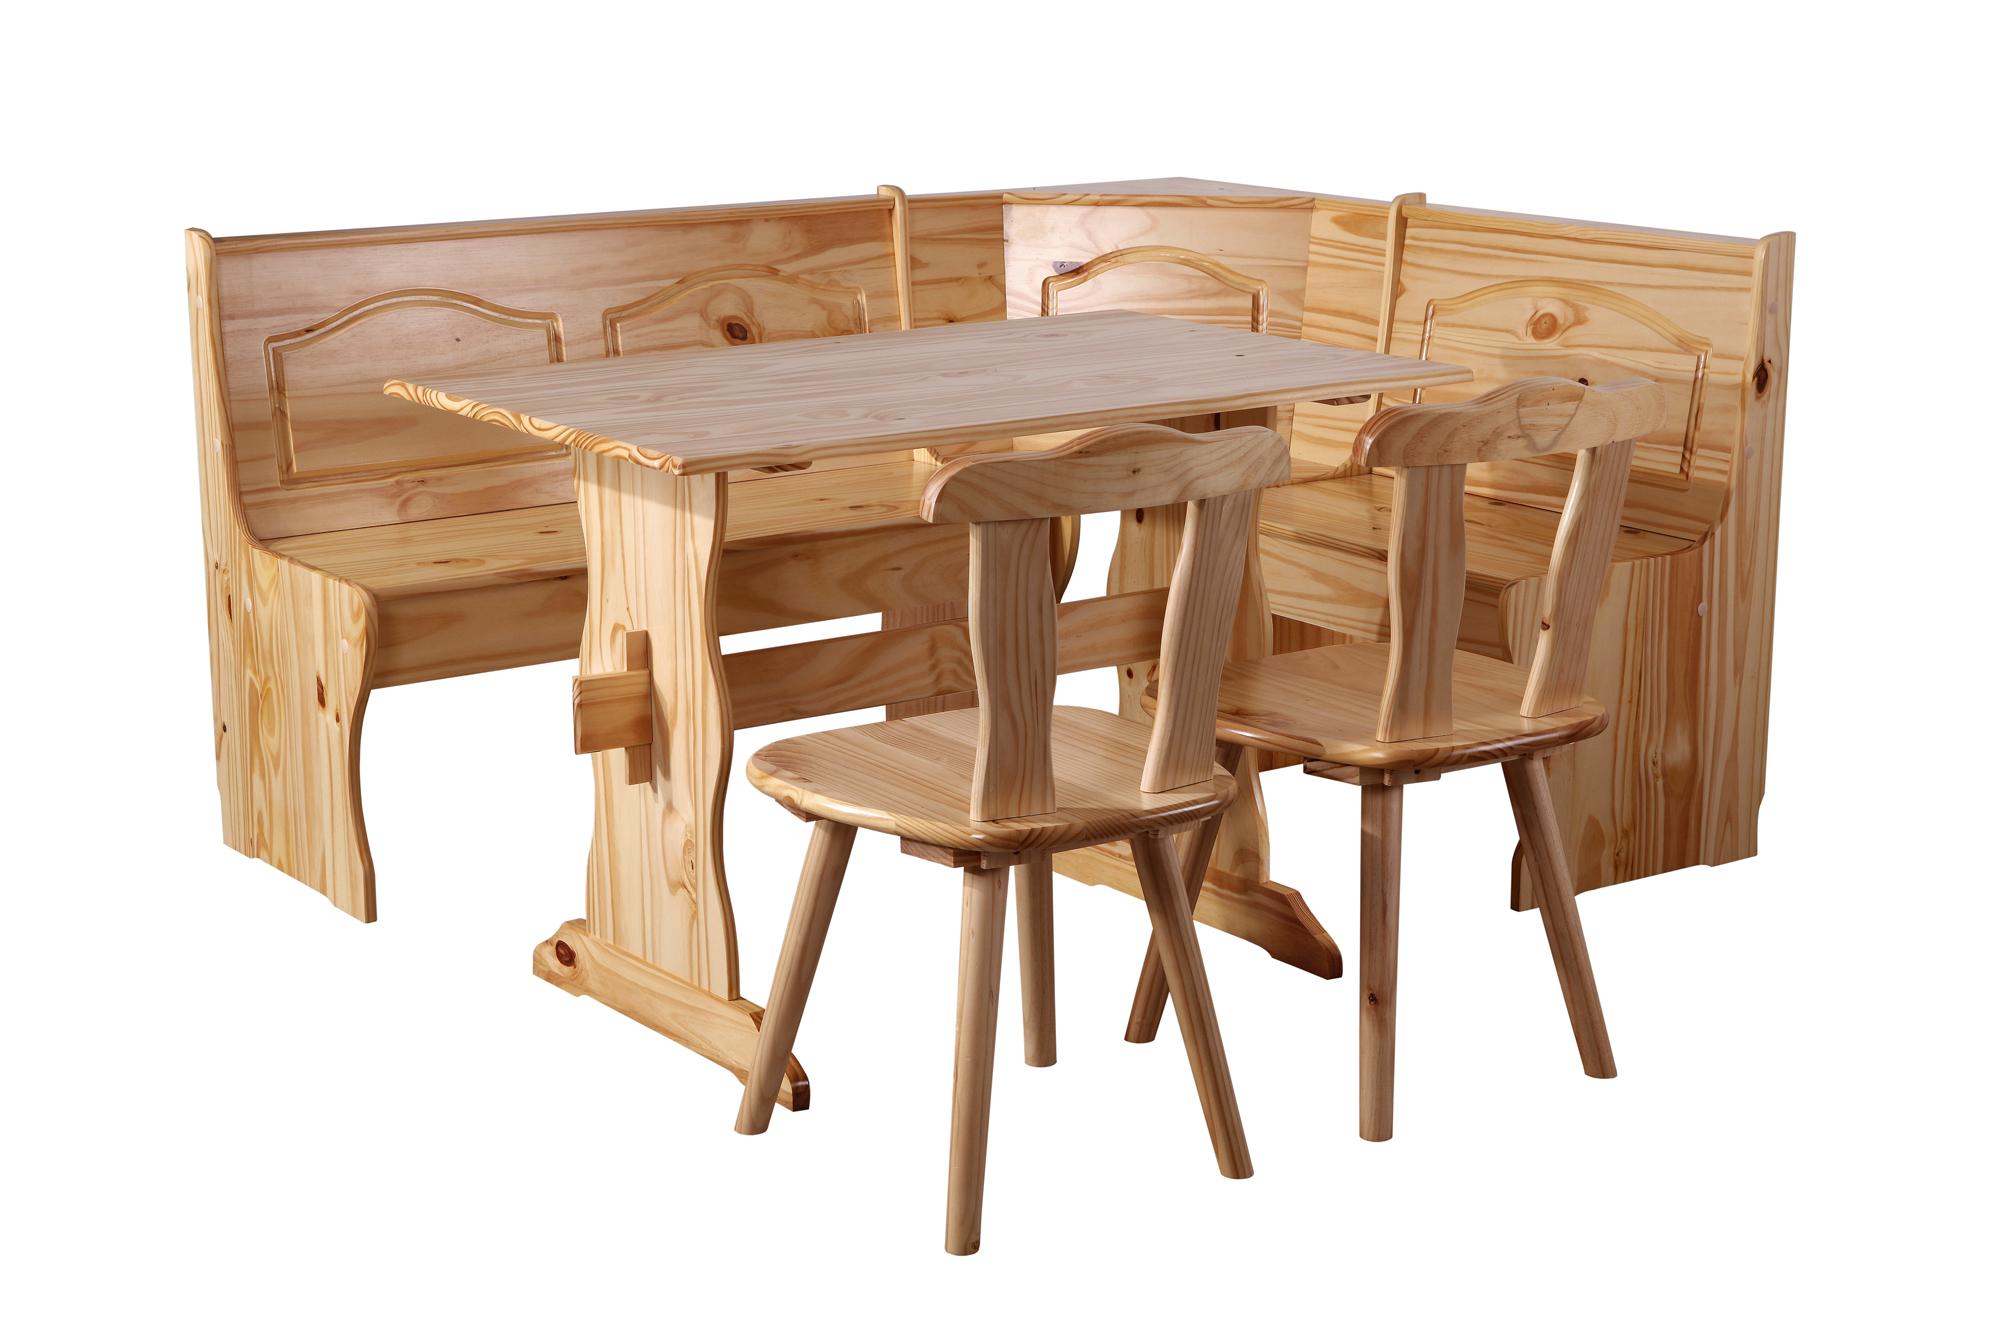 Panca Ad Angolo Per Cucina : Sixbros panca ad angolo rustica pino naturale dc n ebay